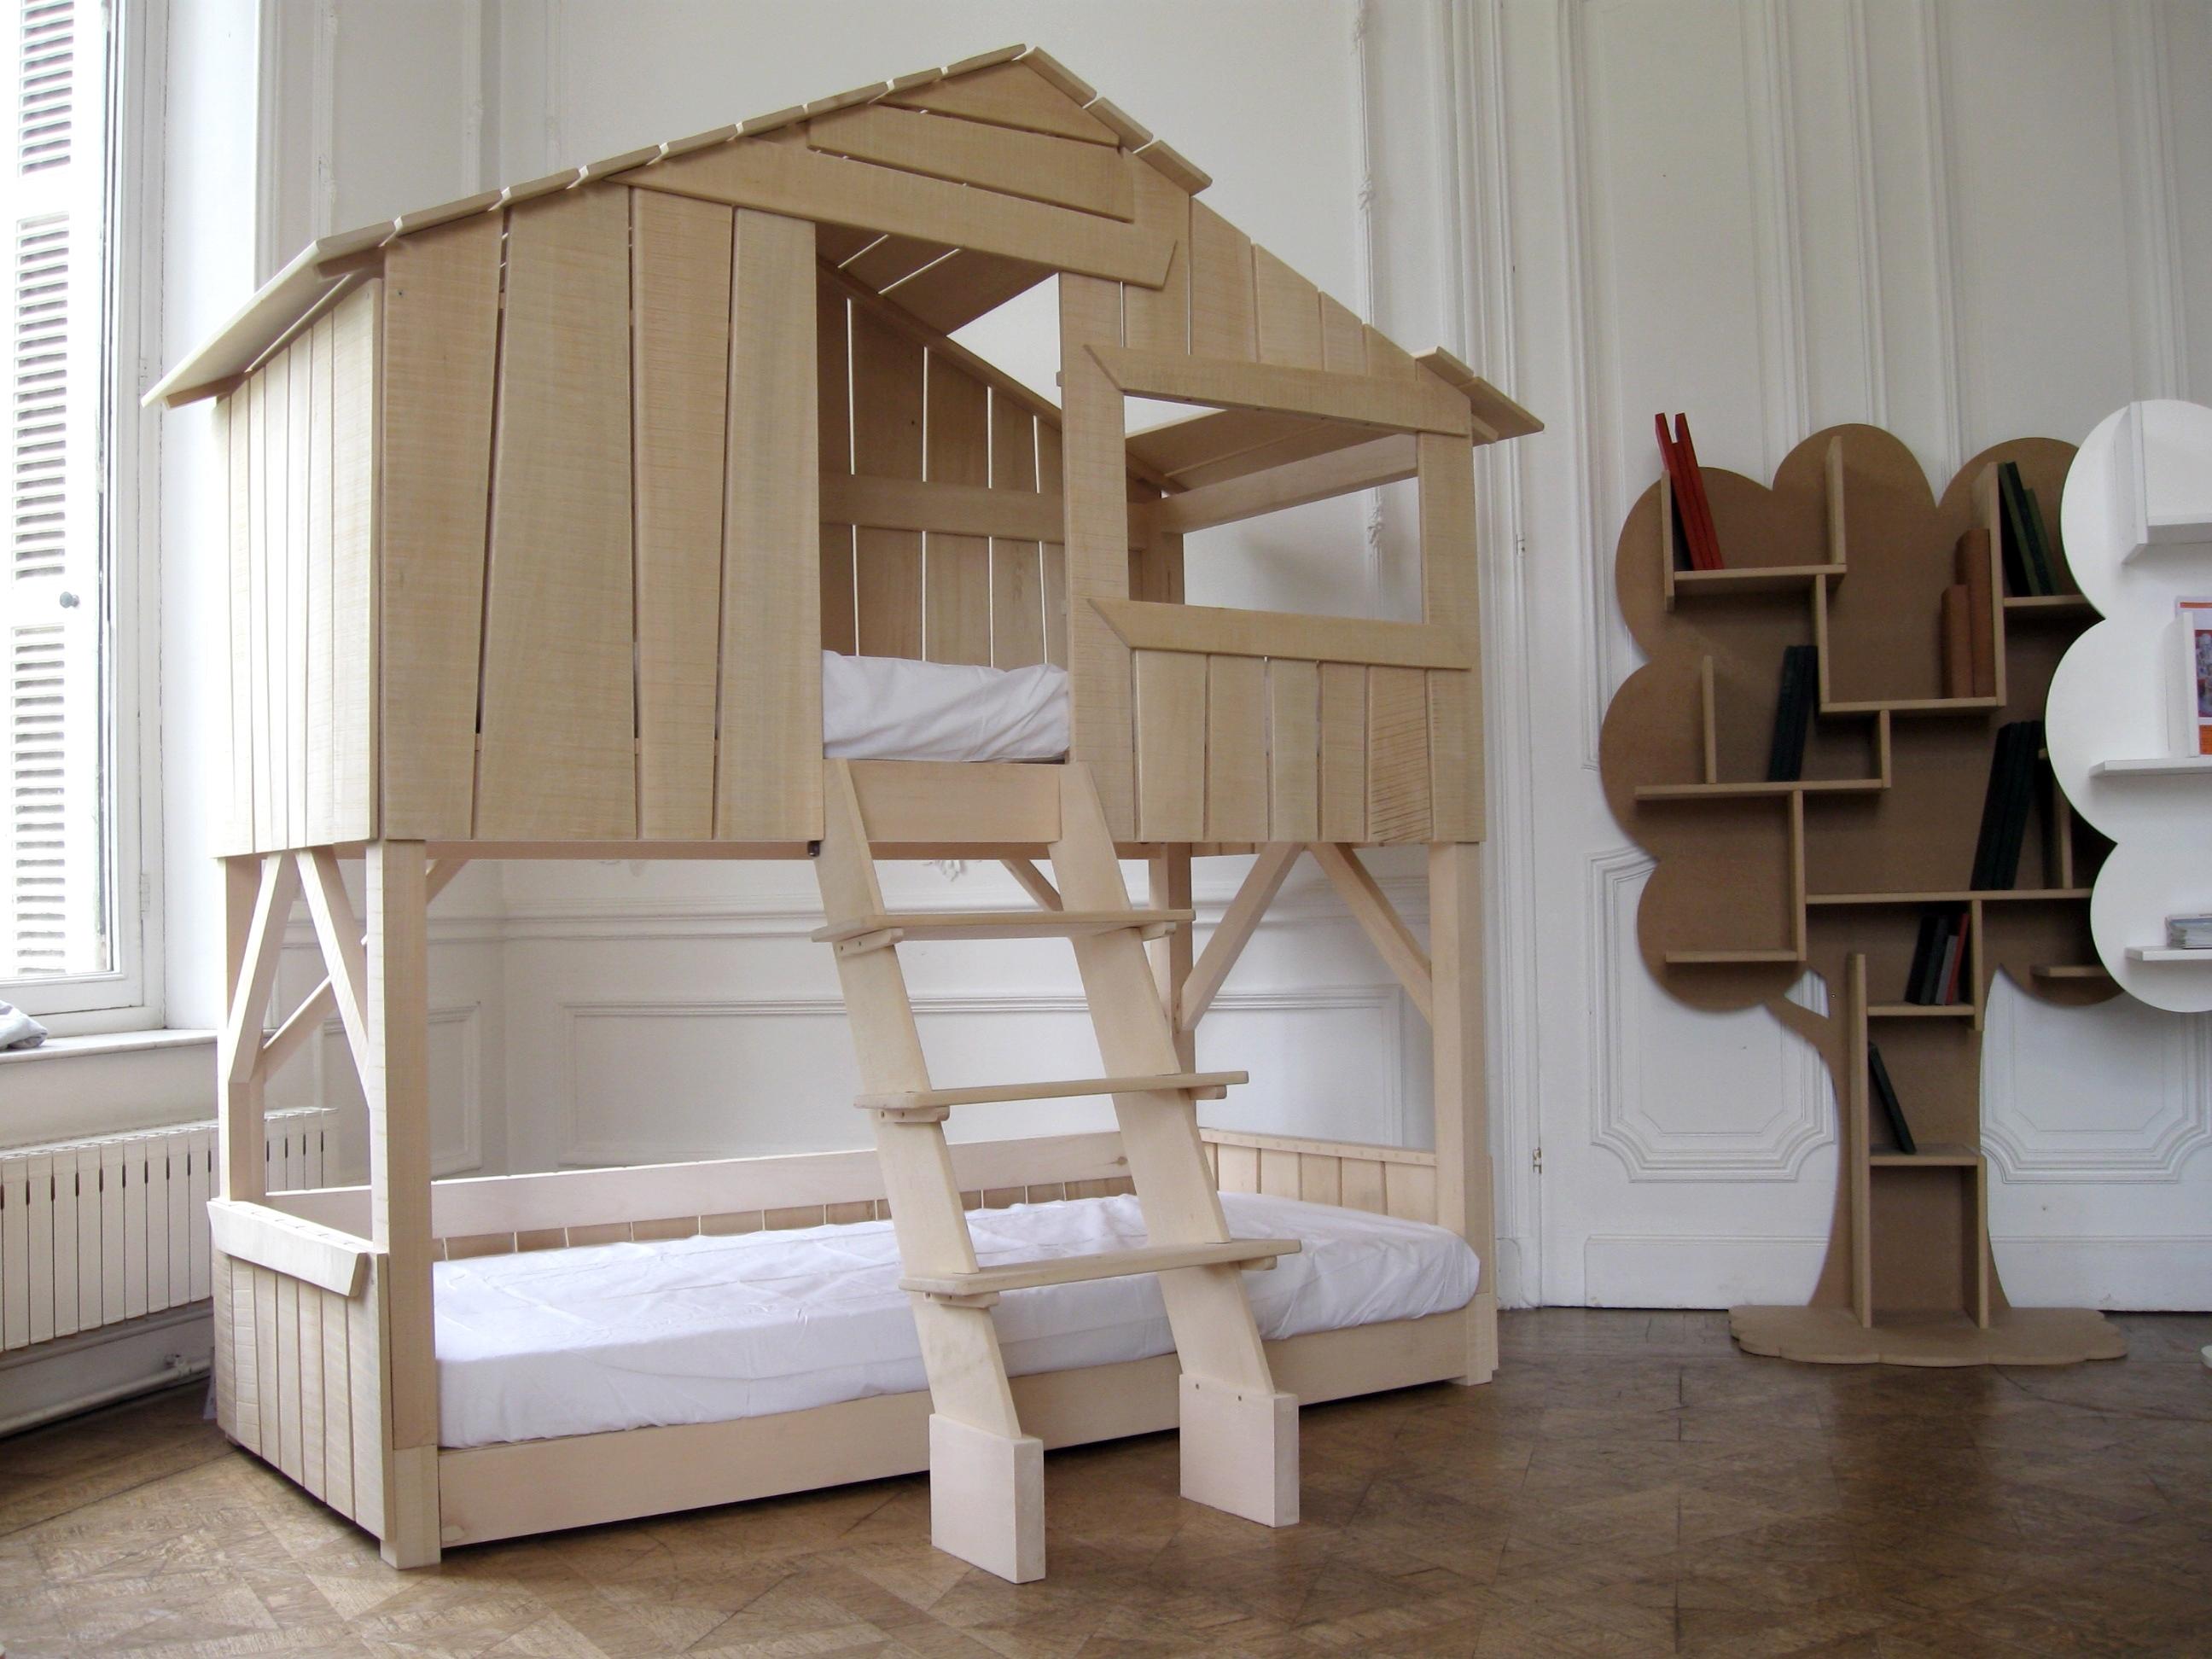 Canapé Laura Conforama Unique Photos Mobilier Chambre B 39 1